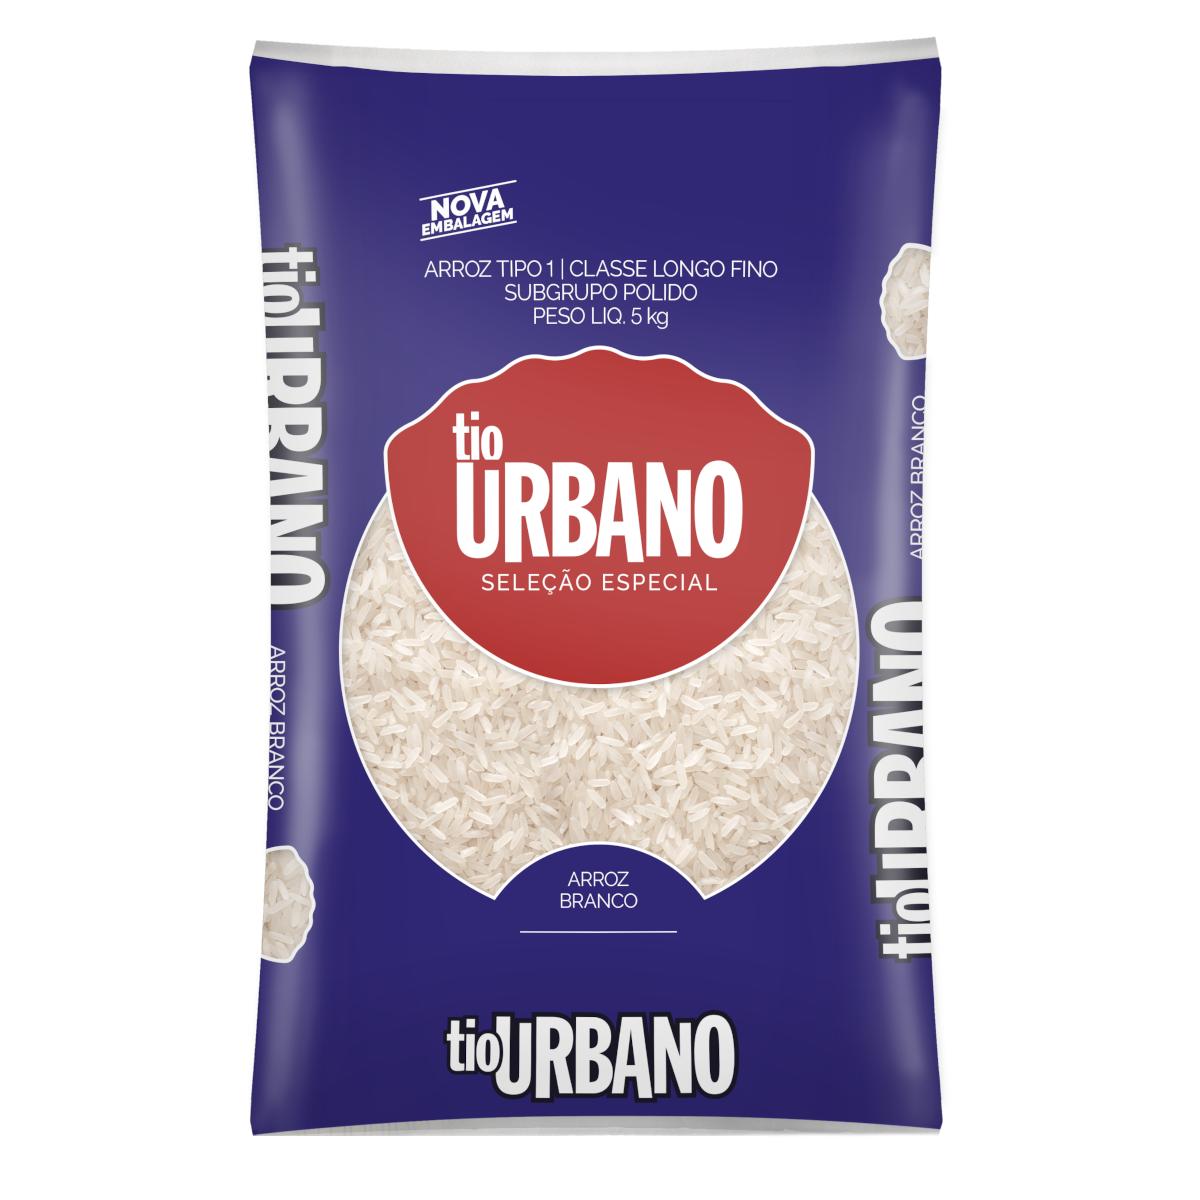 Arroz tipo 1 5kg Tio Urbano pacote PCT